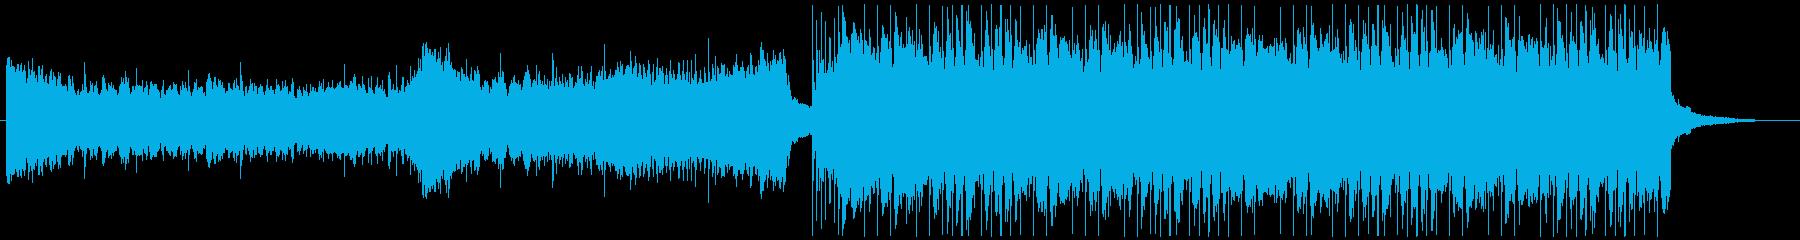 Colour Bass / insertの再生済みの波形